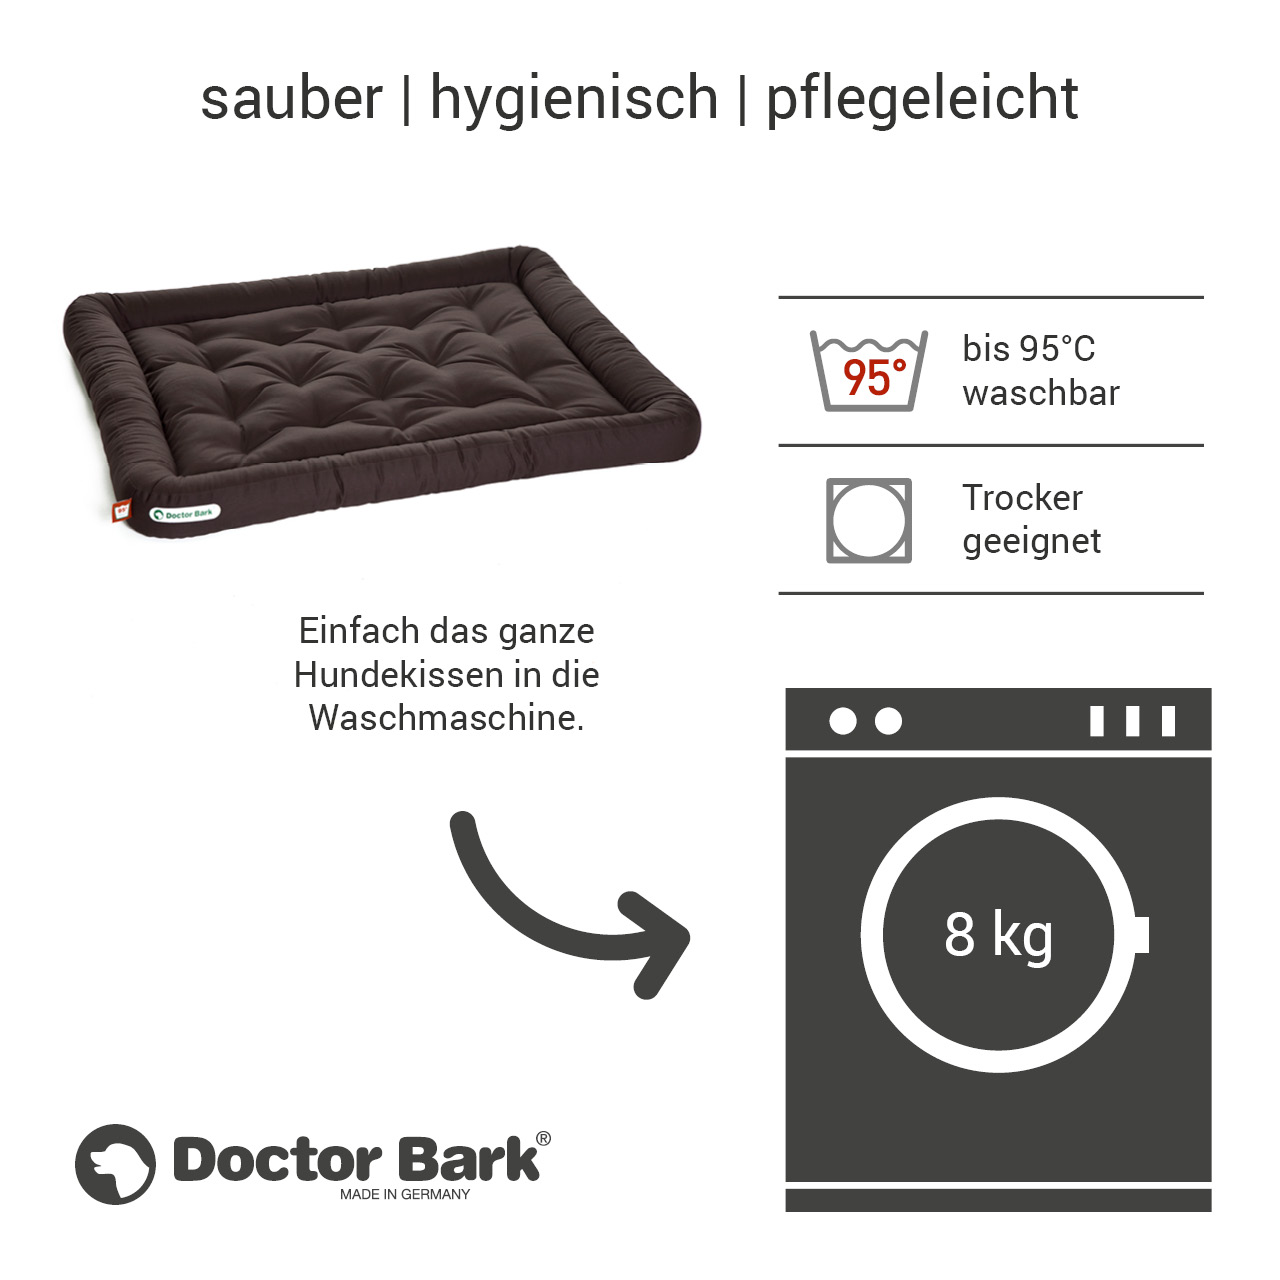 Lounge-Hundekissen / Hundebett orthopädisch Doctor Bark waschbar braun - Gr. XL